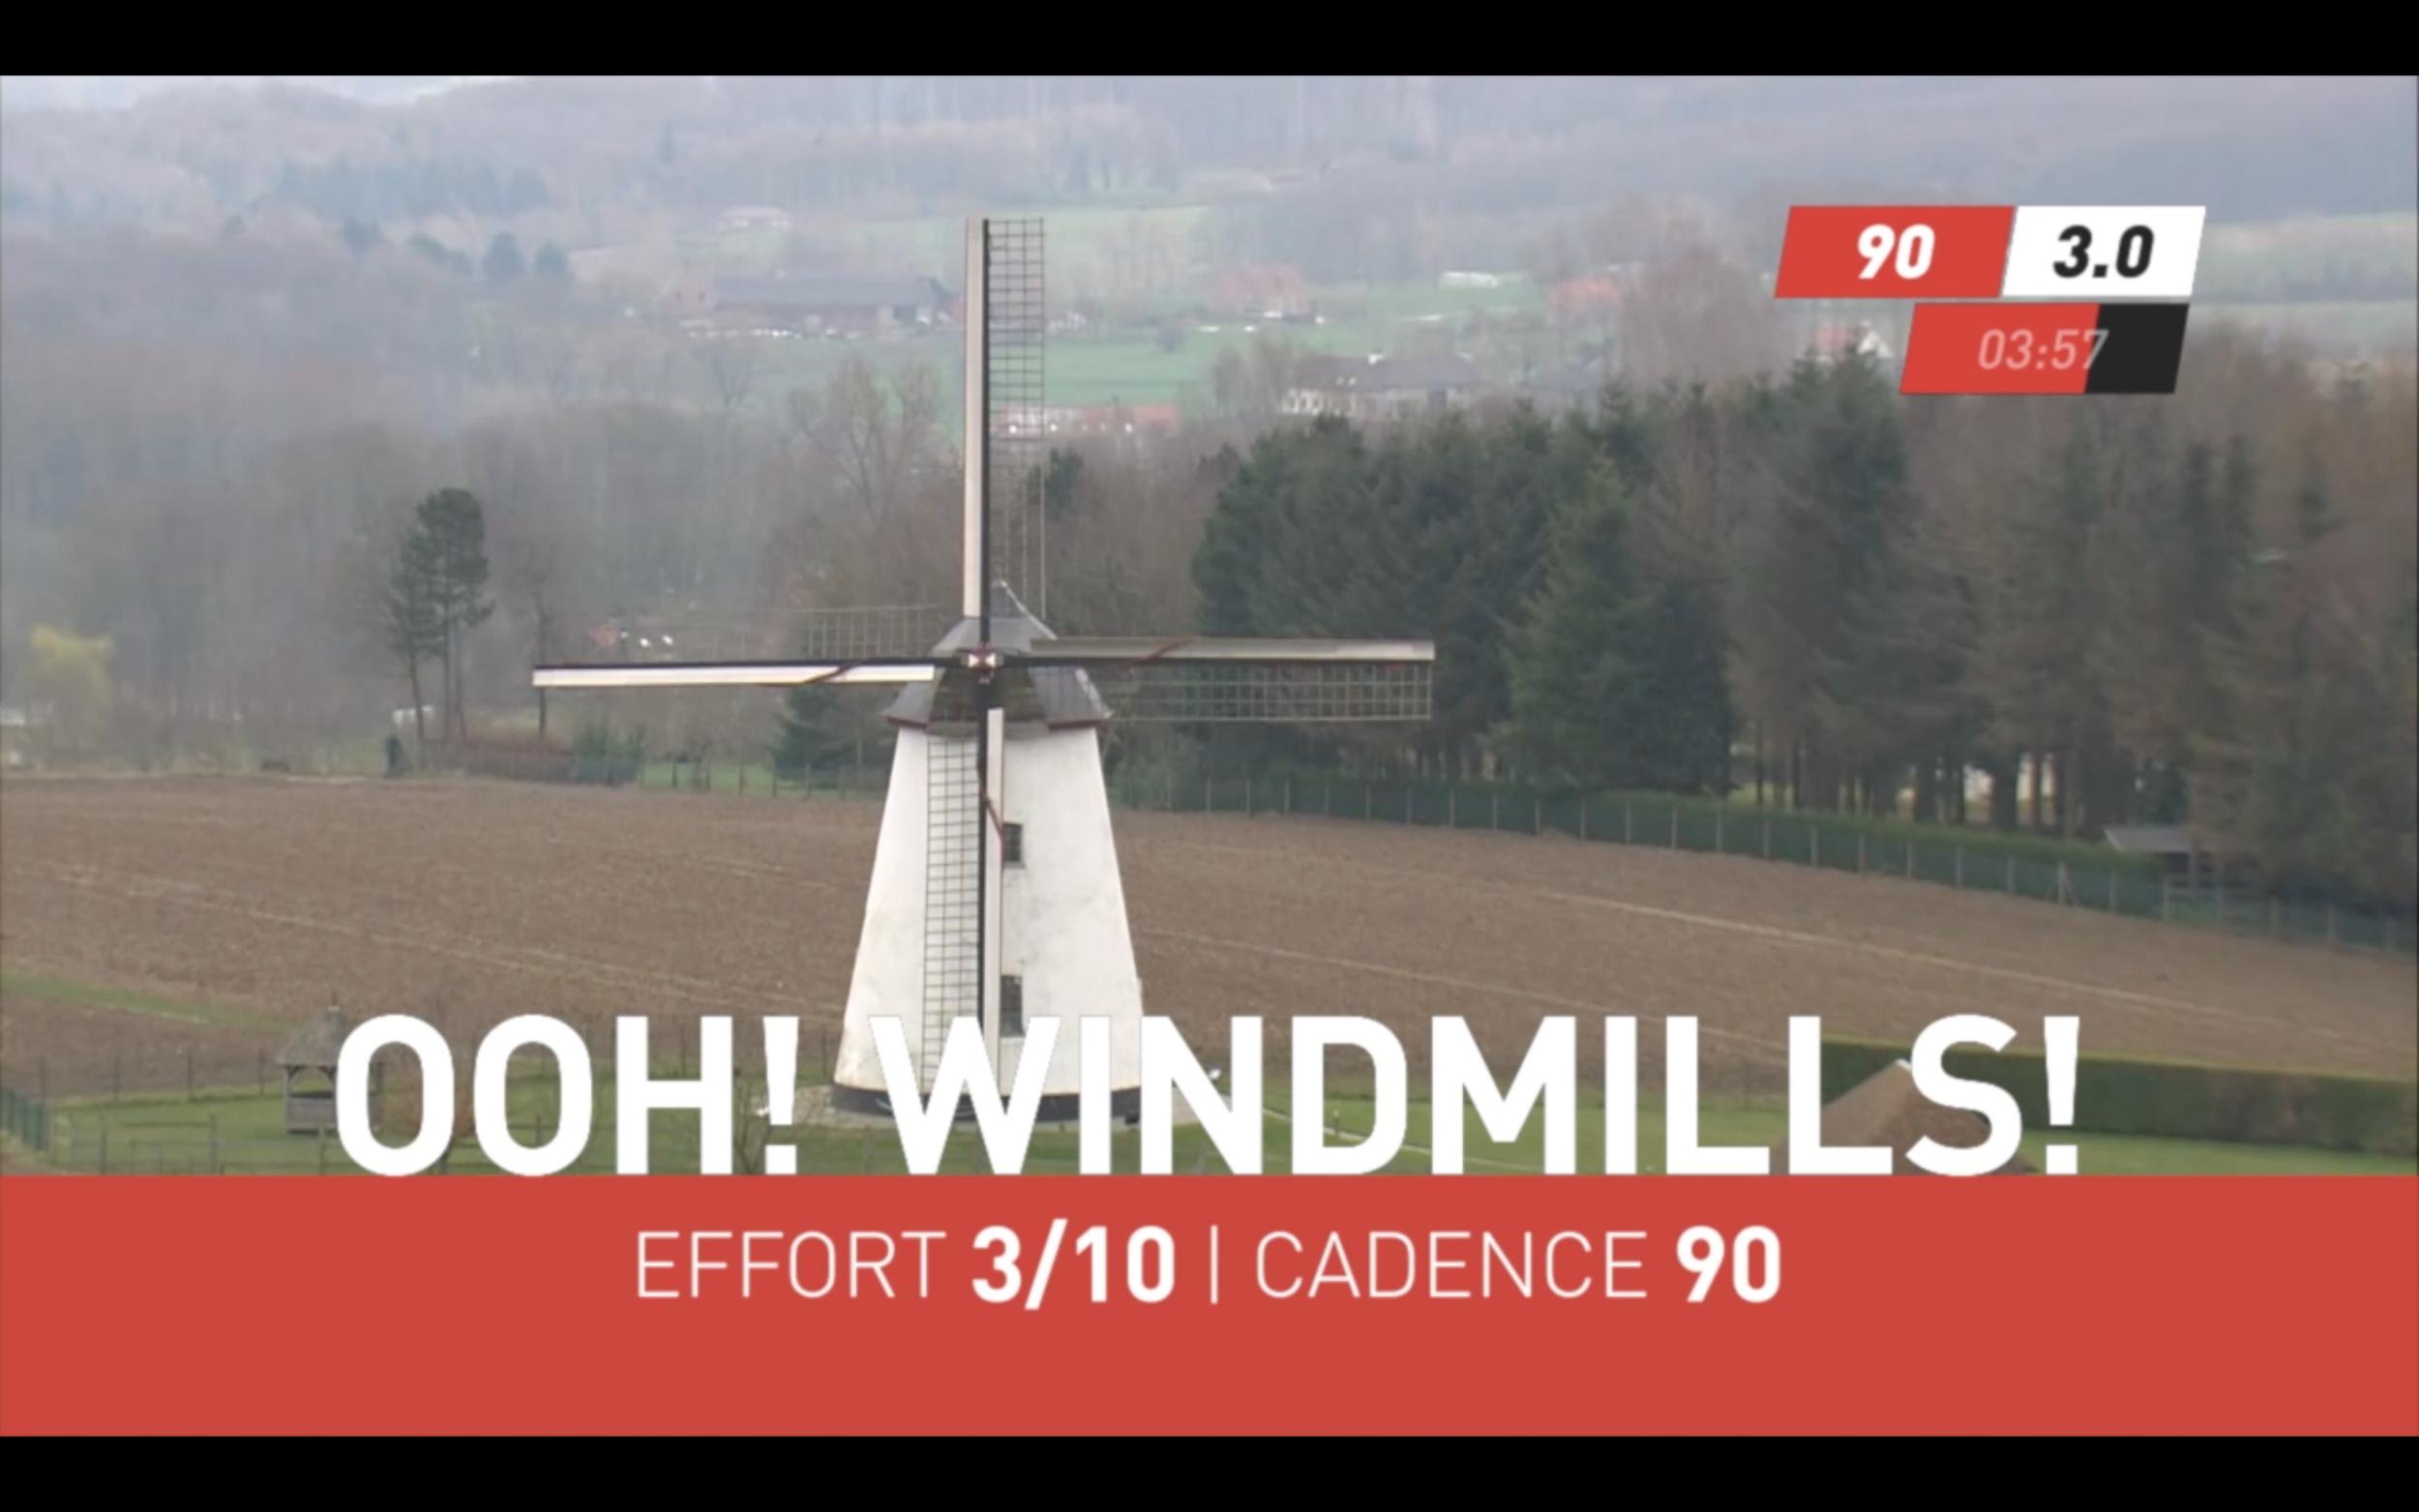 I'm always a sucker for windmills.